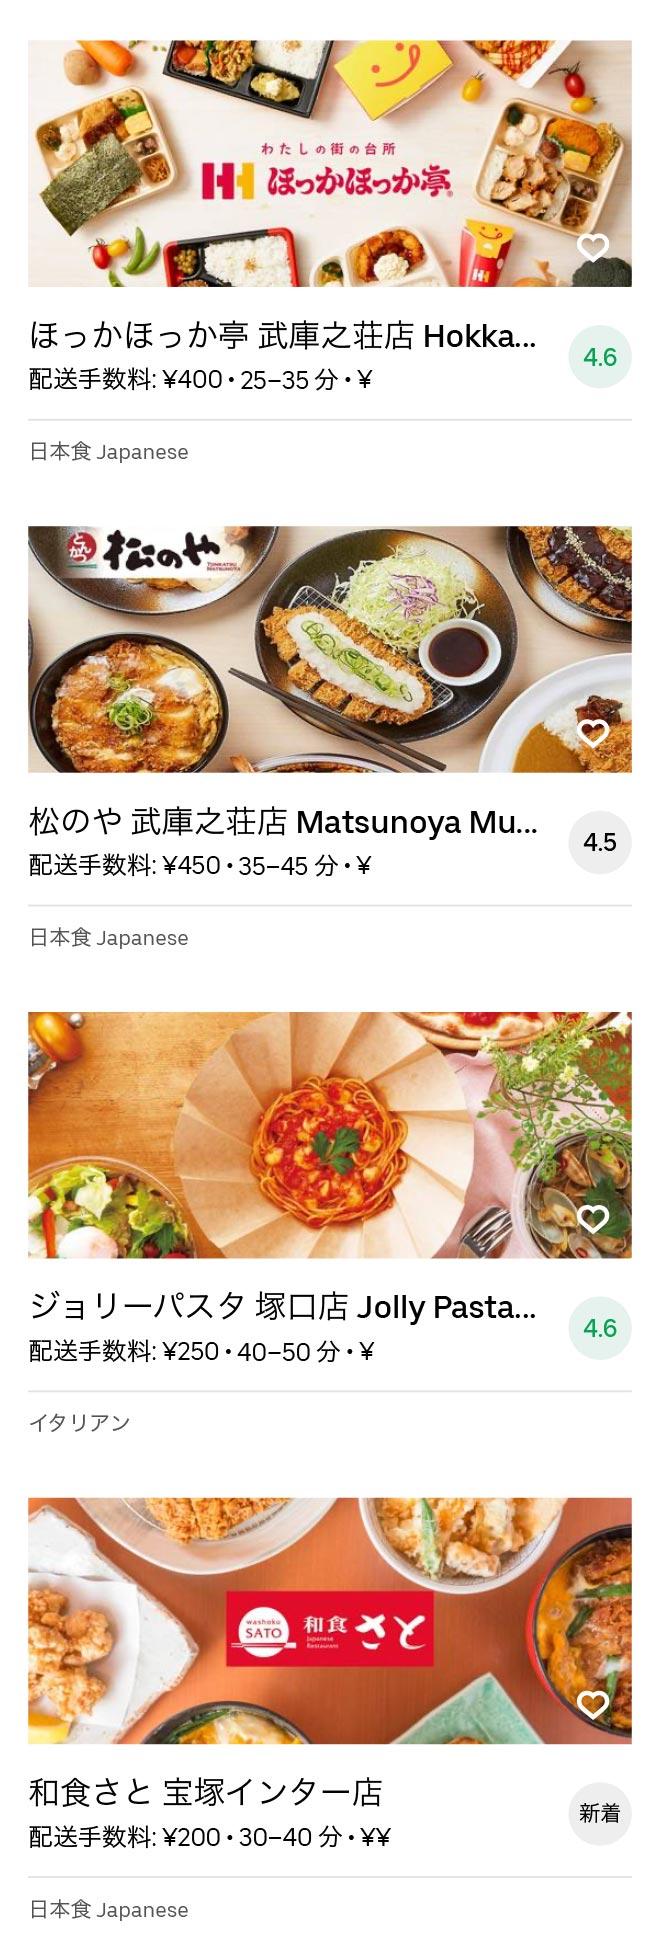 Itami sakuradai menu 2007 04